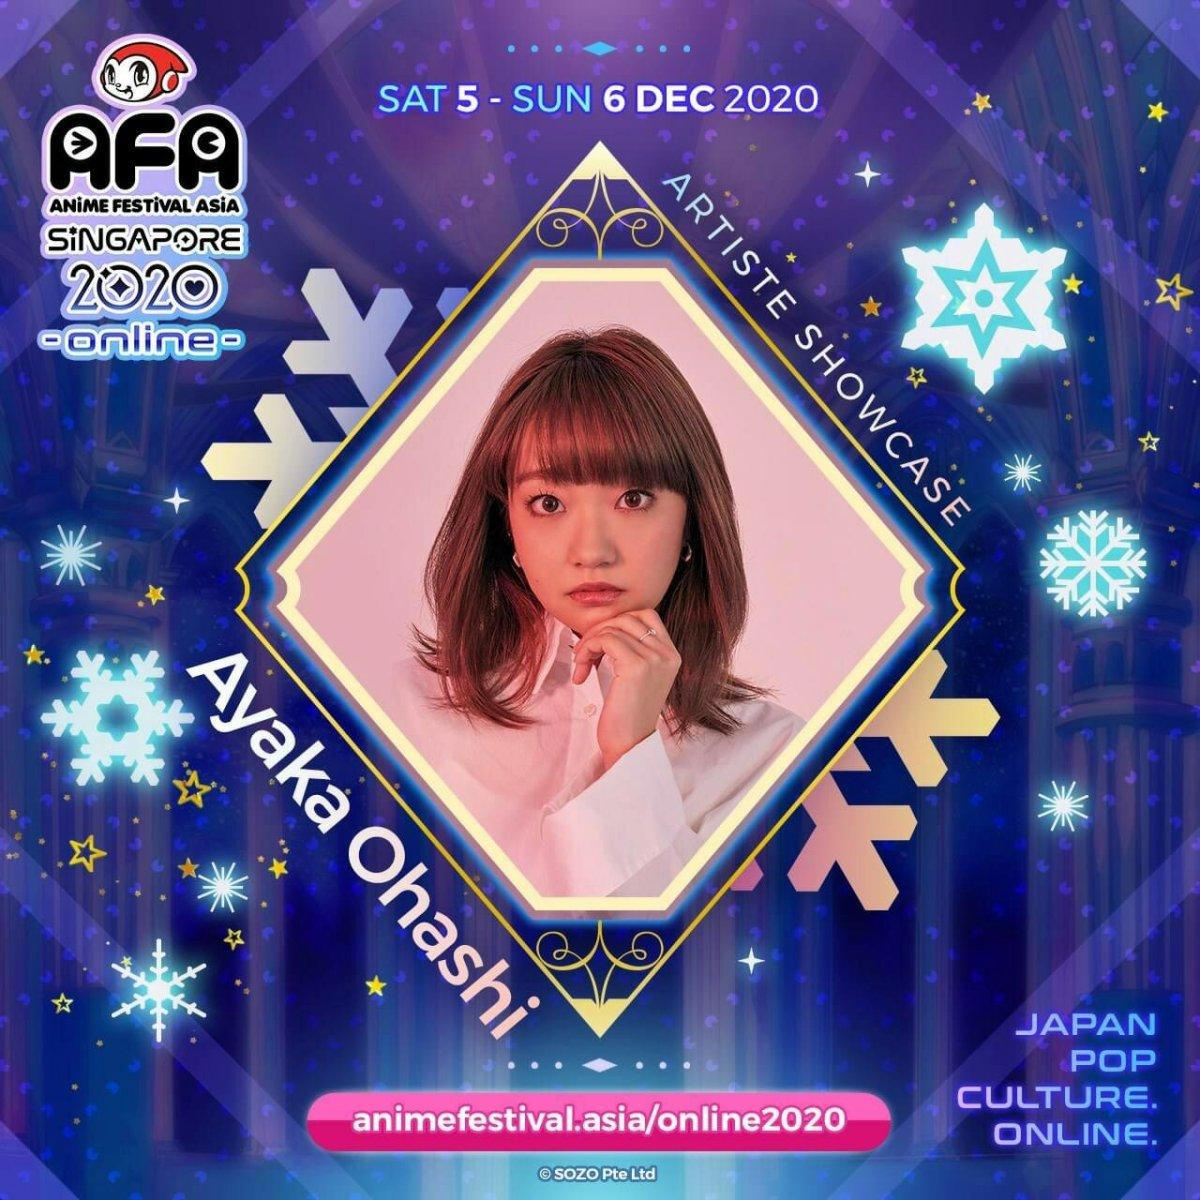 Japan Idol Group 22/7, Moona Hoshinova, Ayaka Ohashi, dan Lebih Banyak Lagi Musisi & Idol Favorit Tampil di Stage Virtual AFA! 6